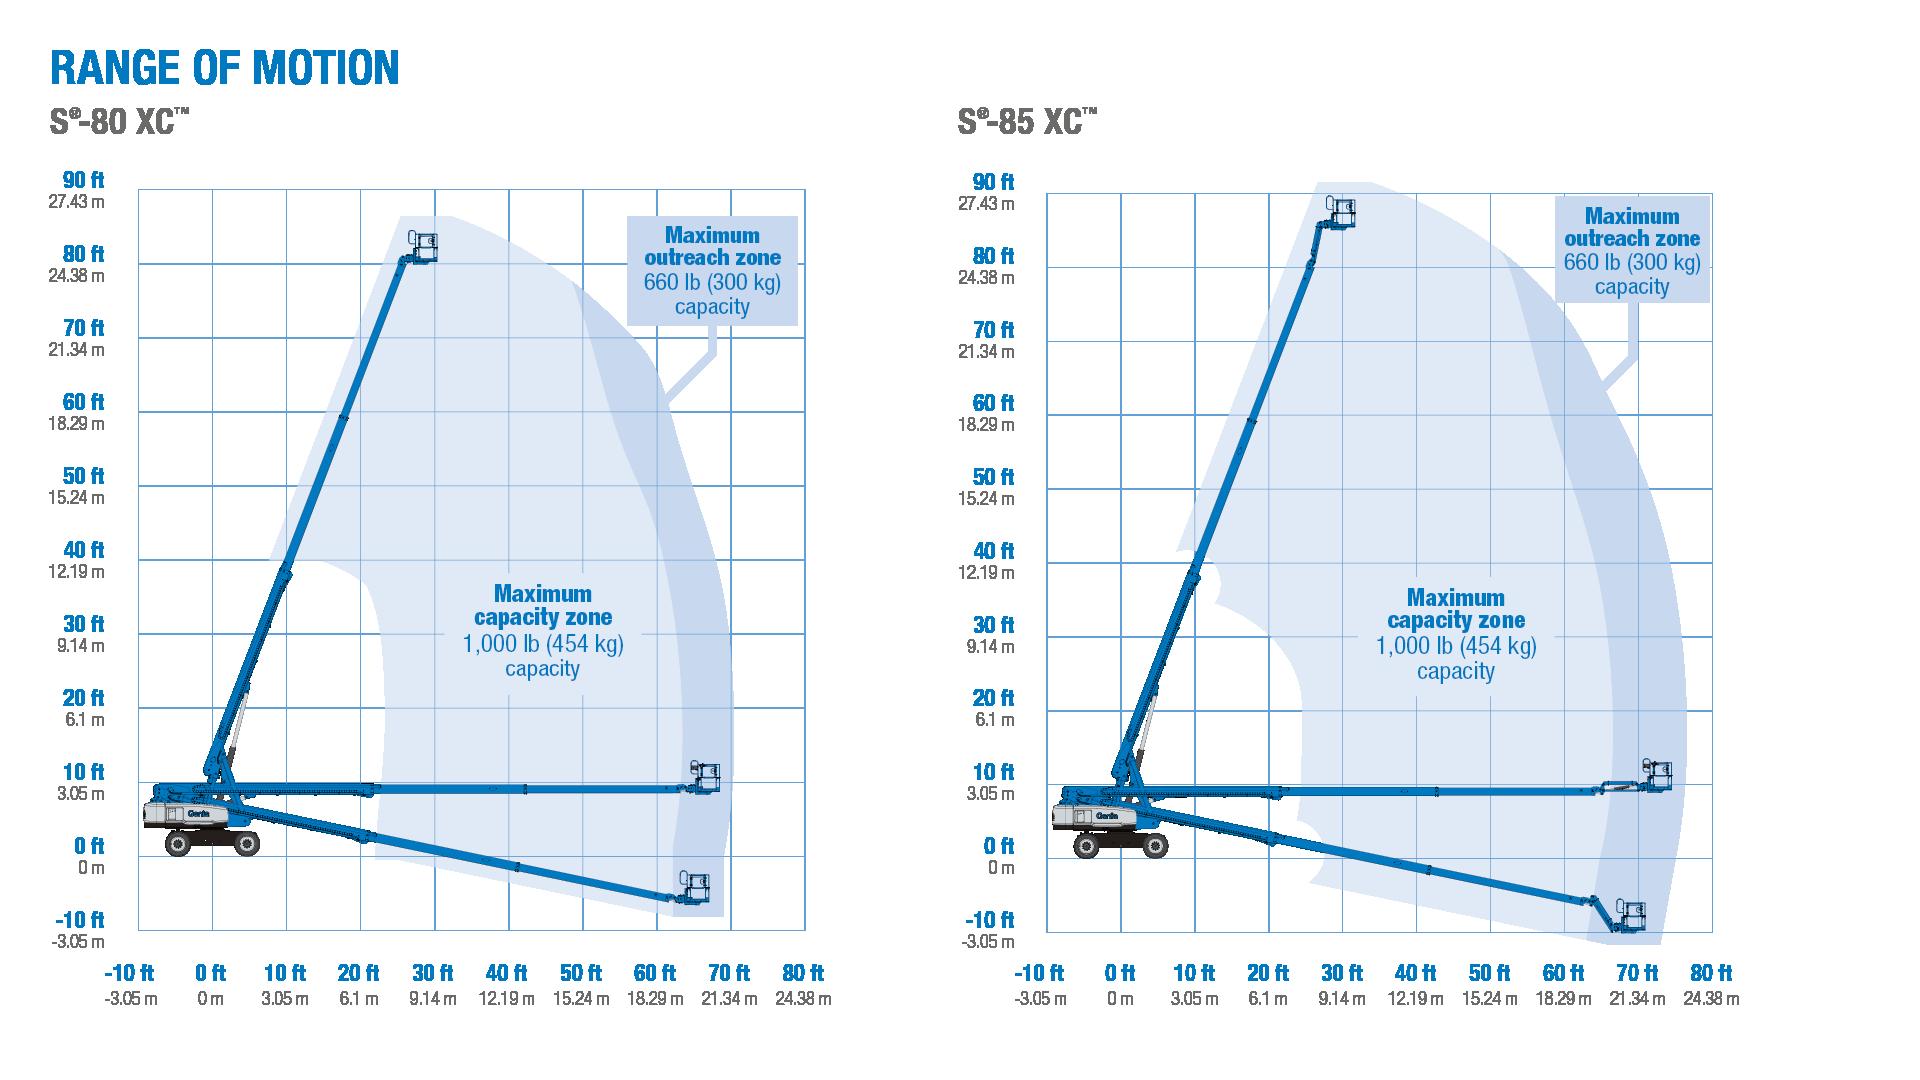 Range of motion - Genie S-80 XC and S-85 XC telescopic boom lifts